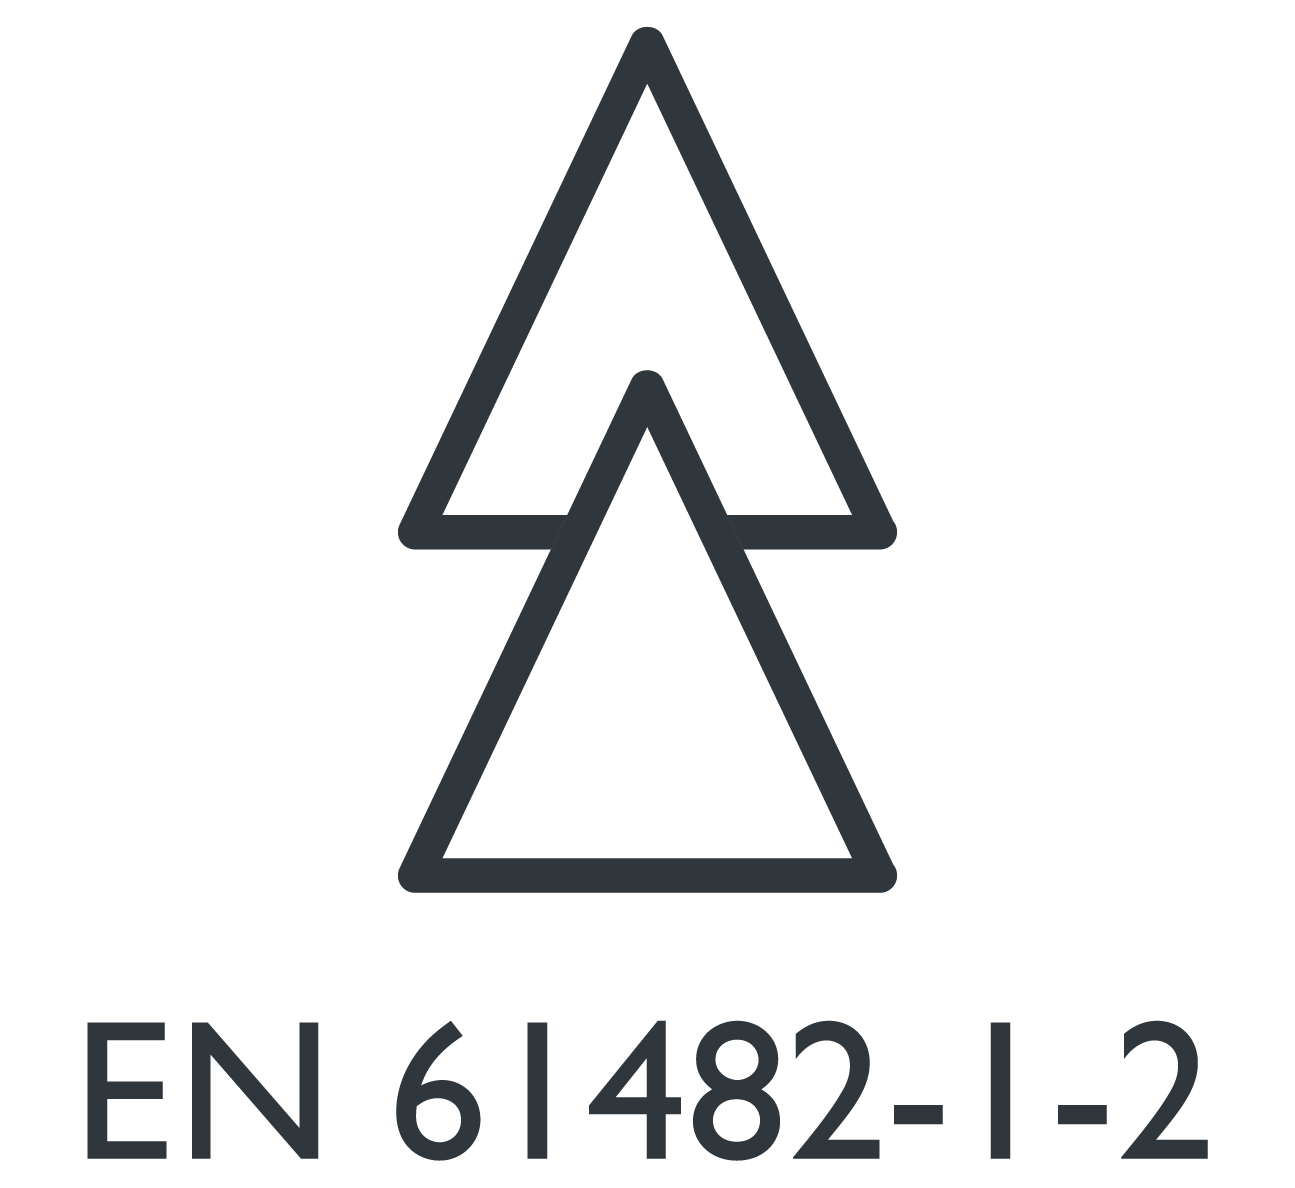 EN 61482-1-2 protective clothing arc flash